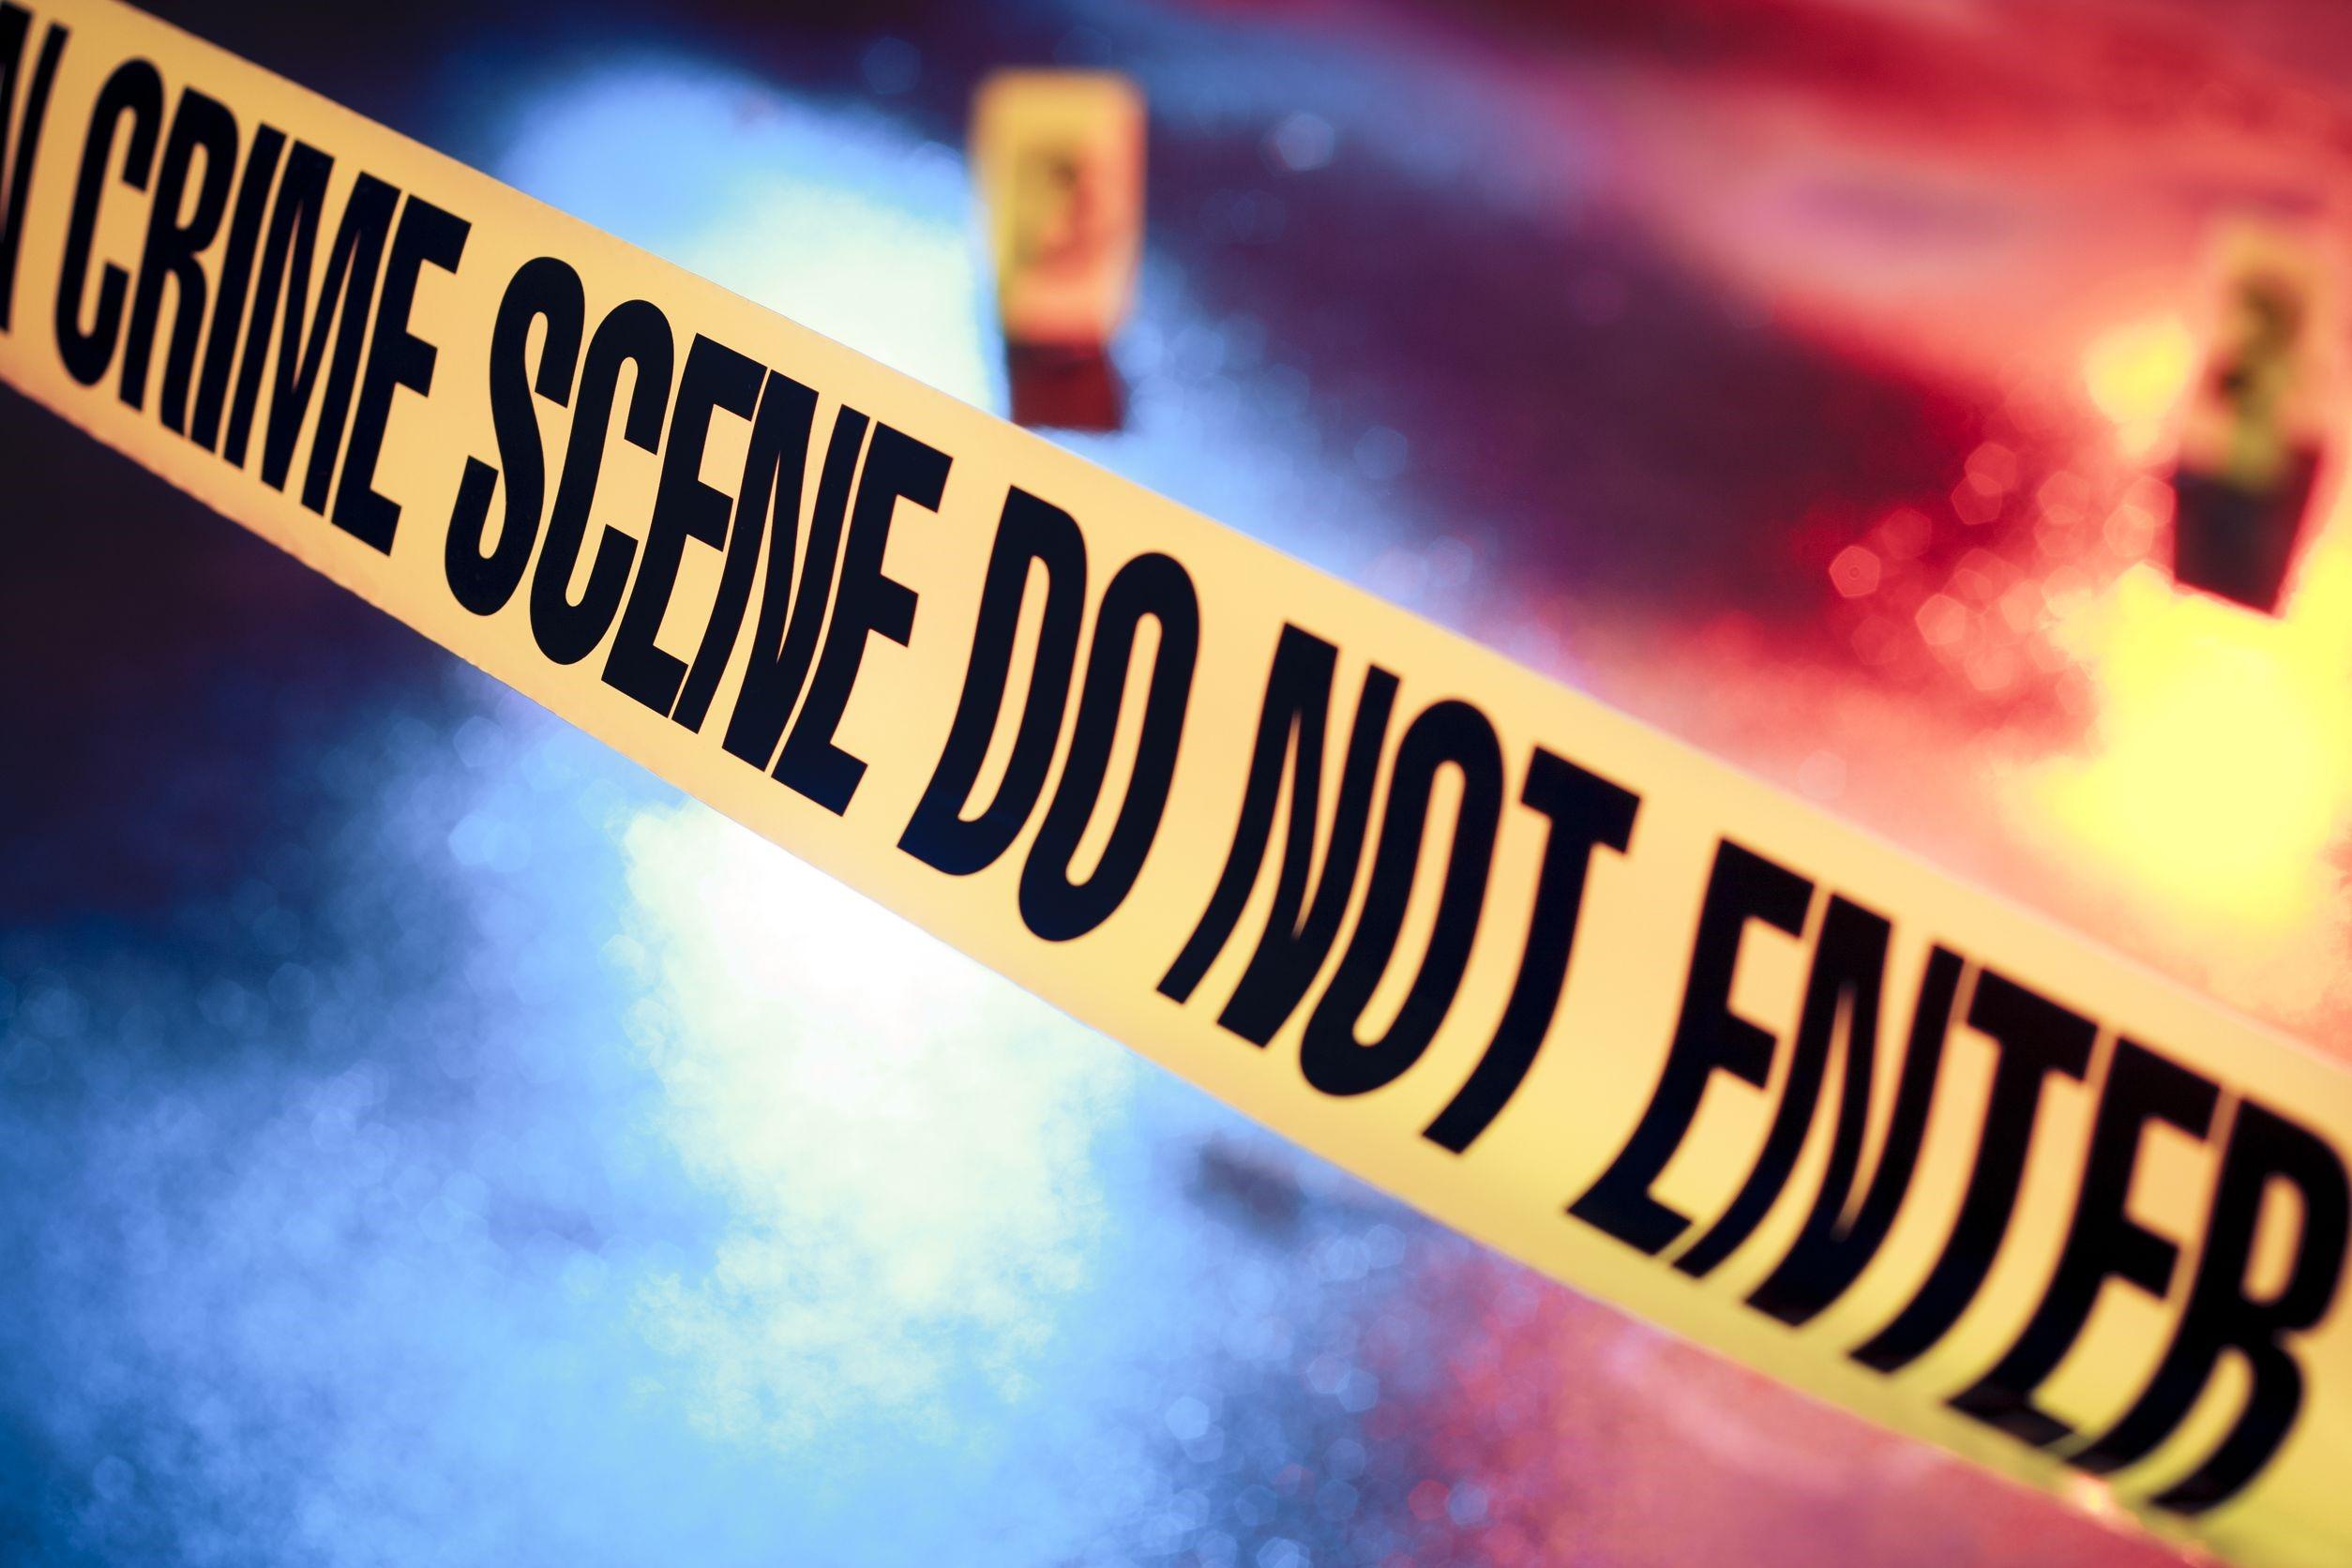 http://twentyfournews.com/2017/03/27/riyas-maulavi-murder-case-blood-stained-clothes-found/